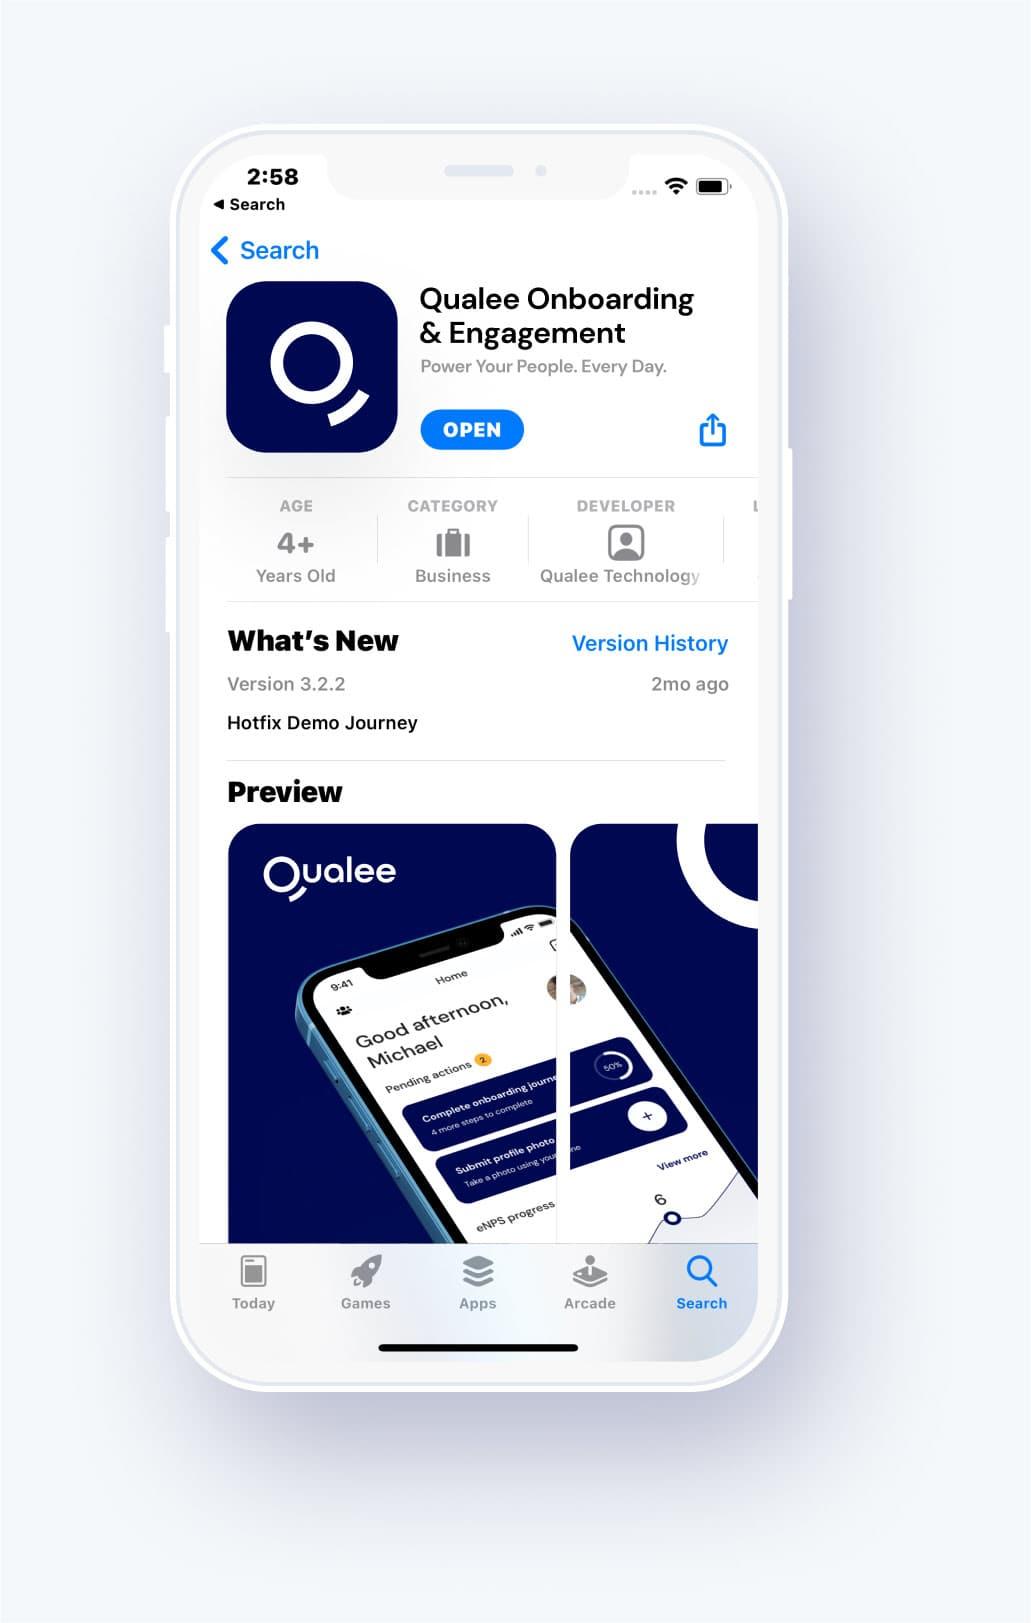 Qualee Employee Onboarding App - Mobile-first Platform